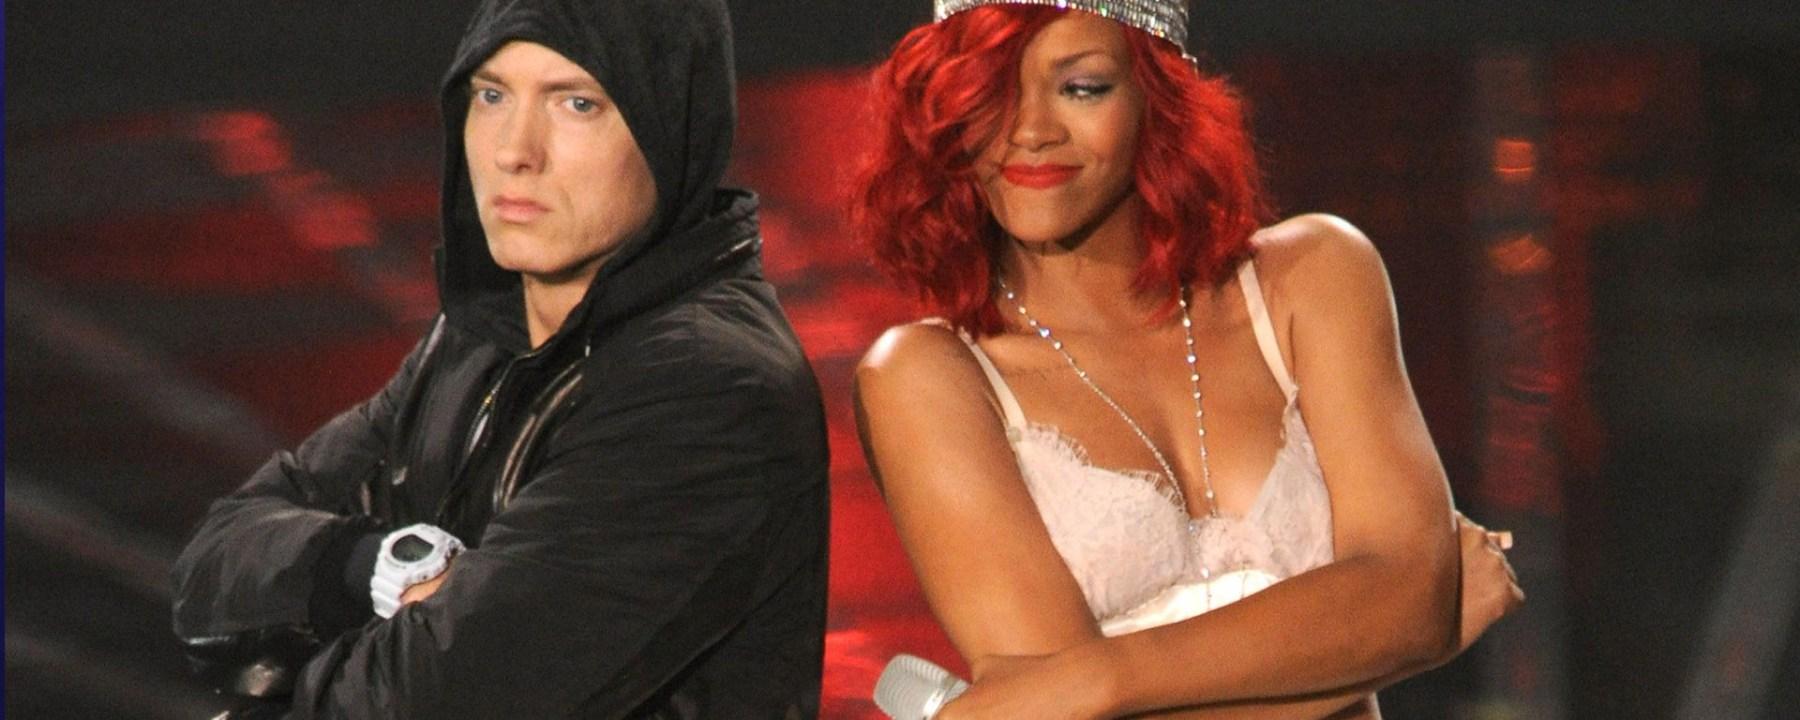 Eminem Rihanna performing Love the Way You Lie Live